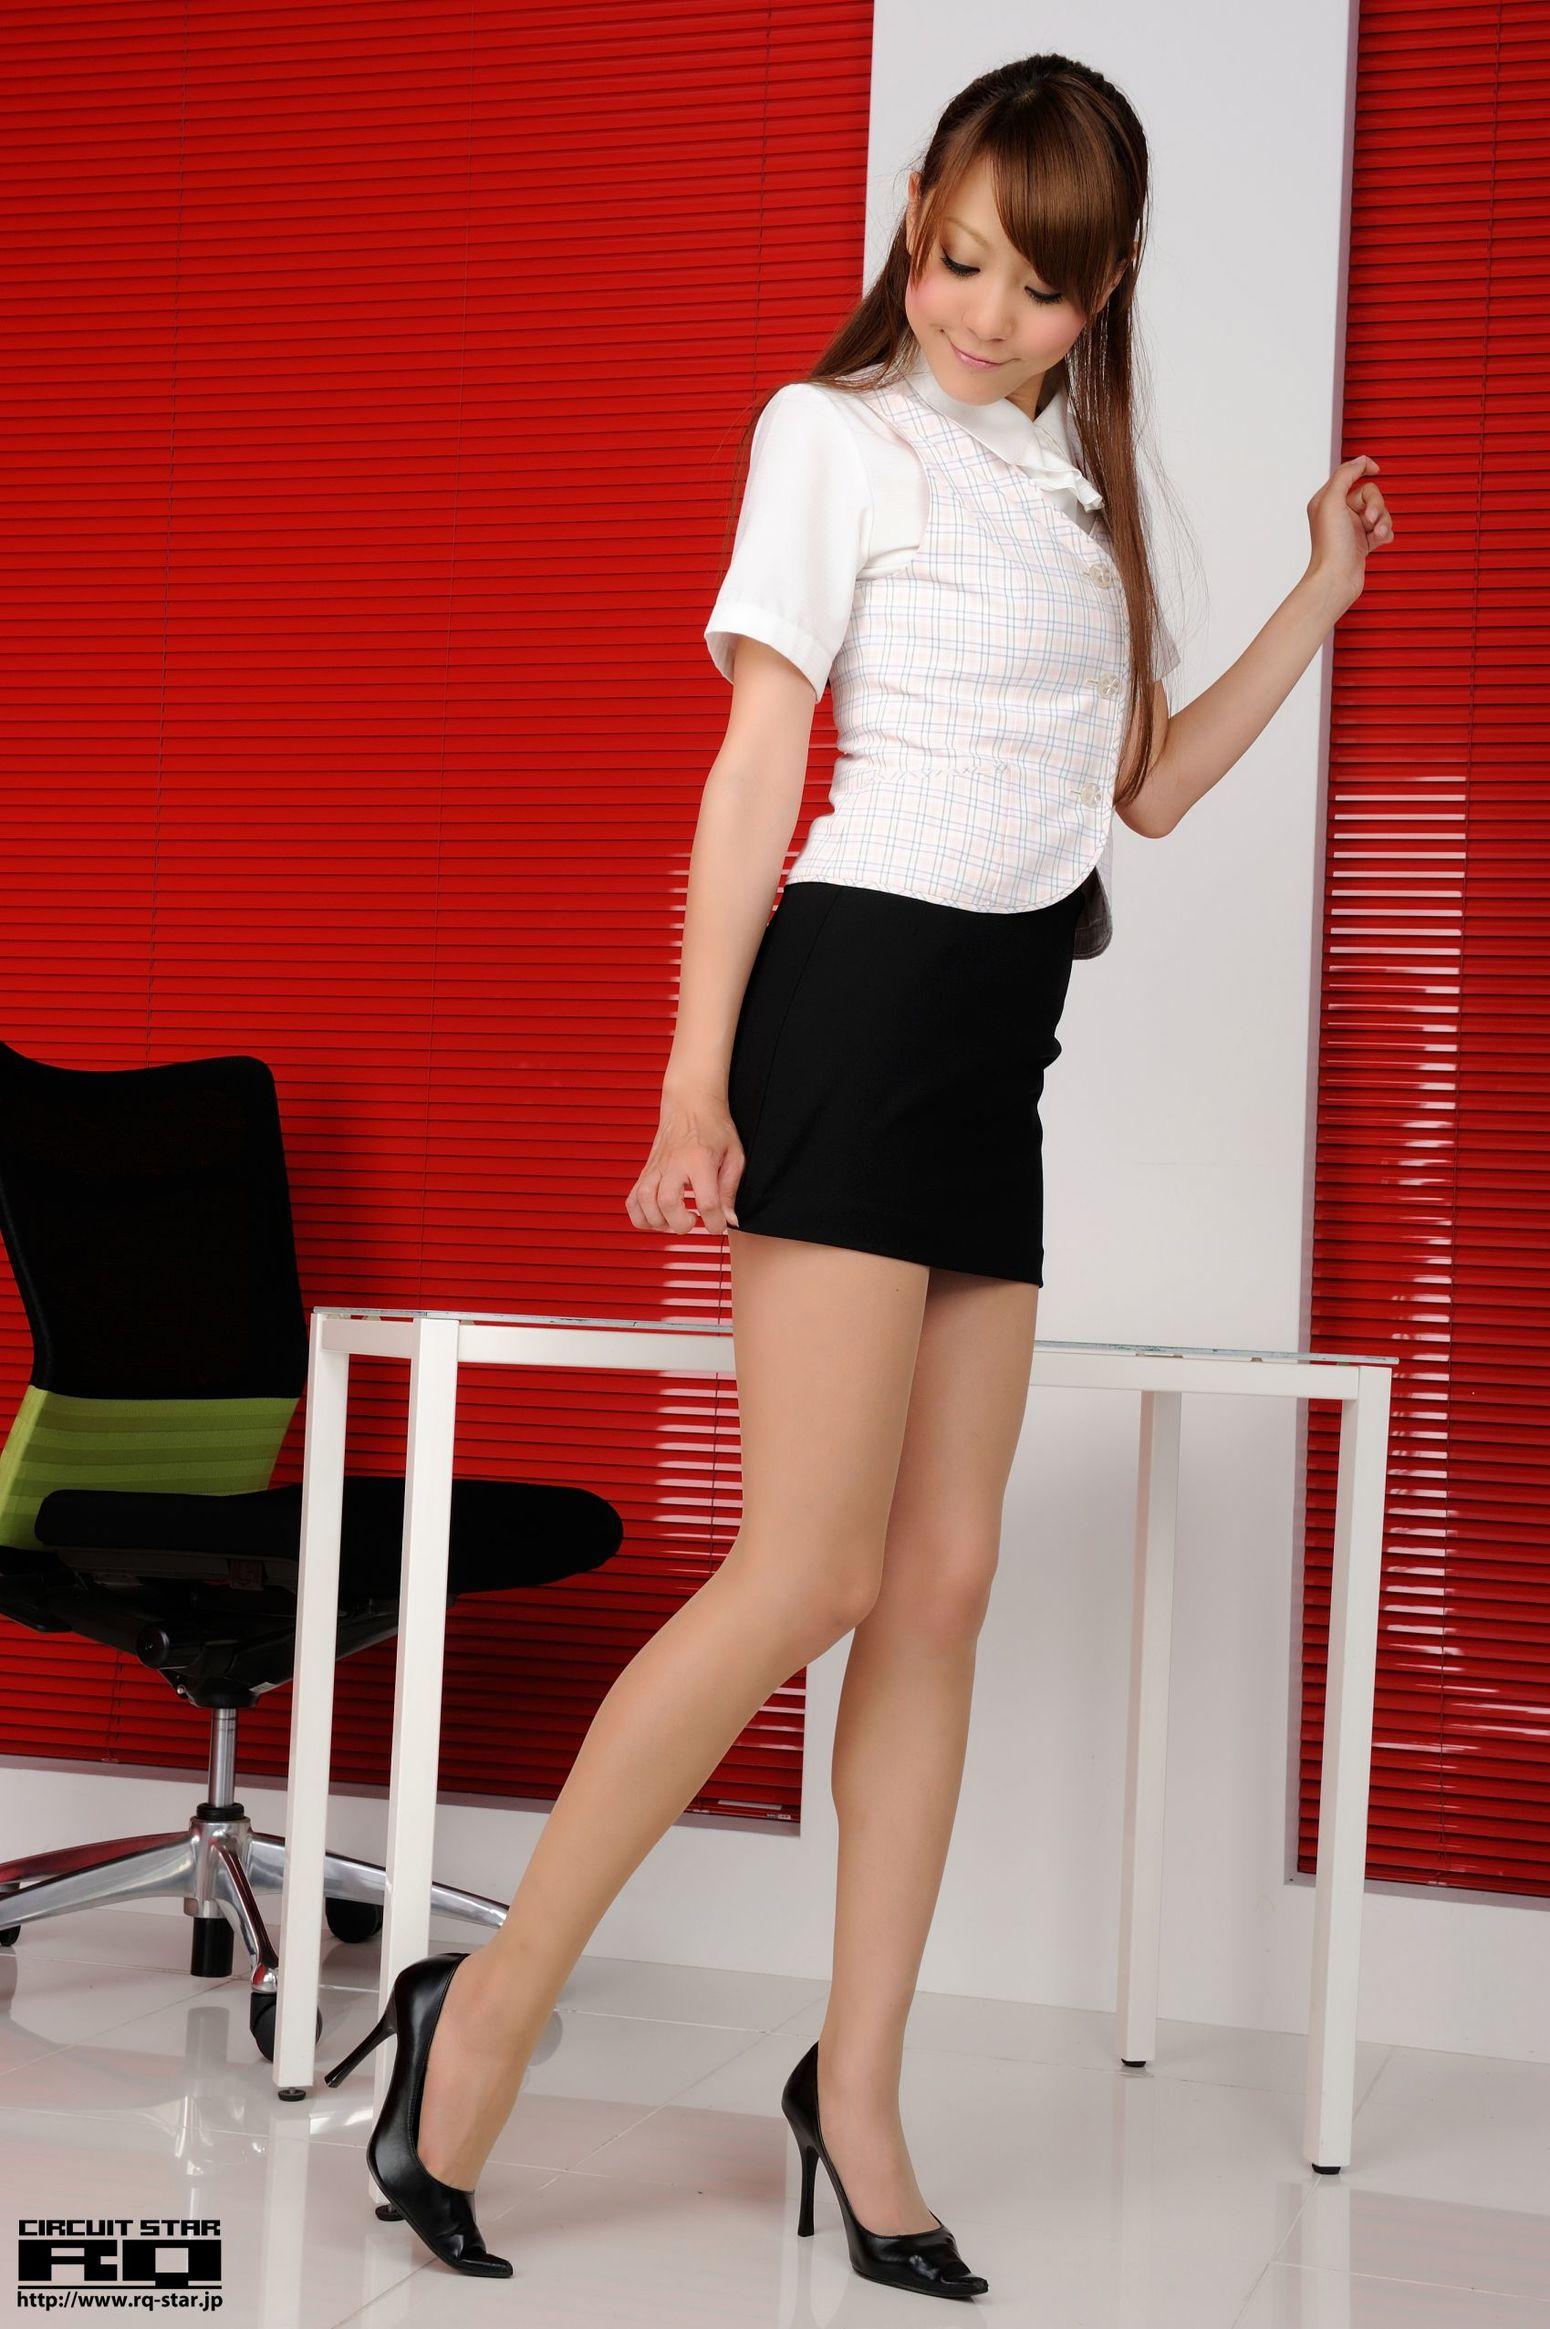 [RQ-STAR] NO.00657 Saki Ueda 植田早紀 Office Lady 写真集1